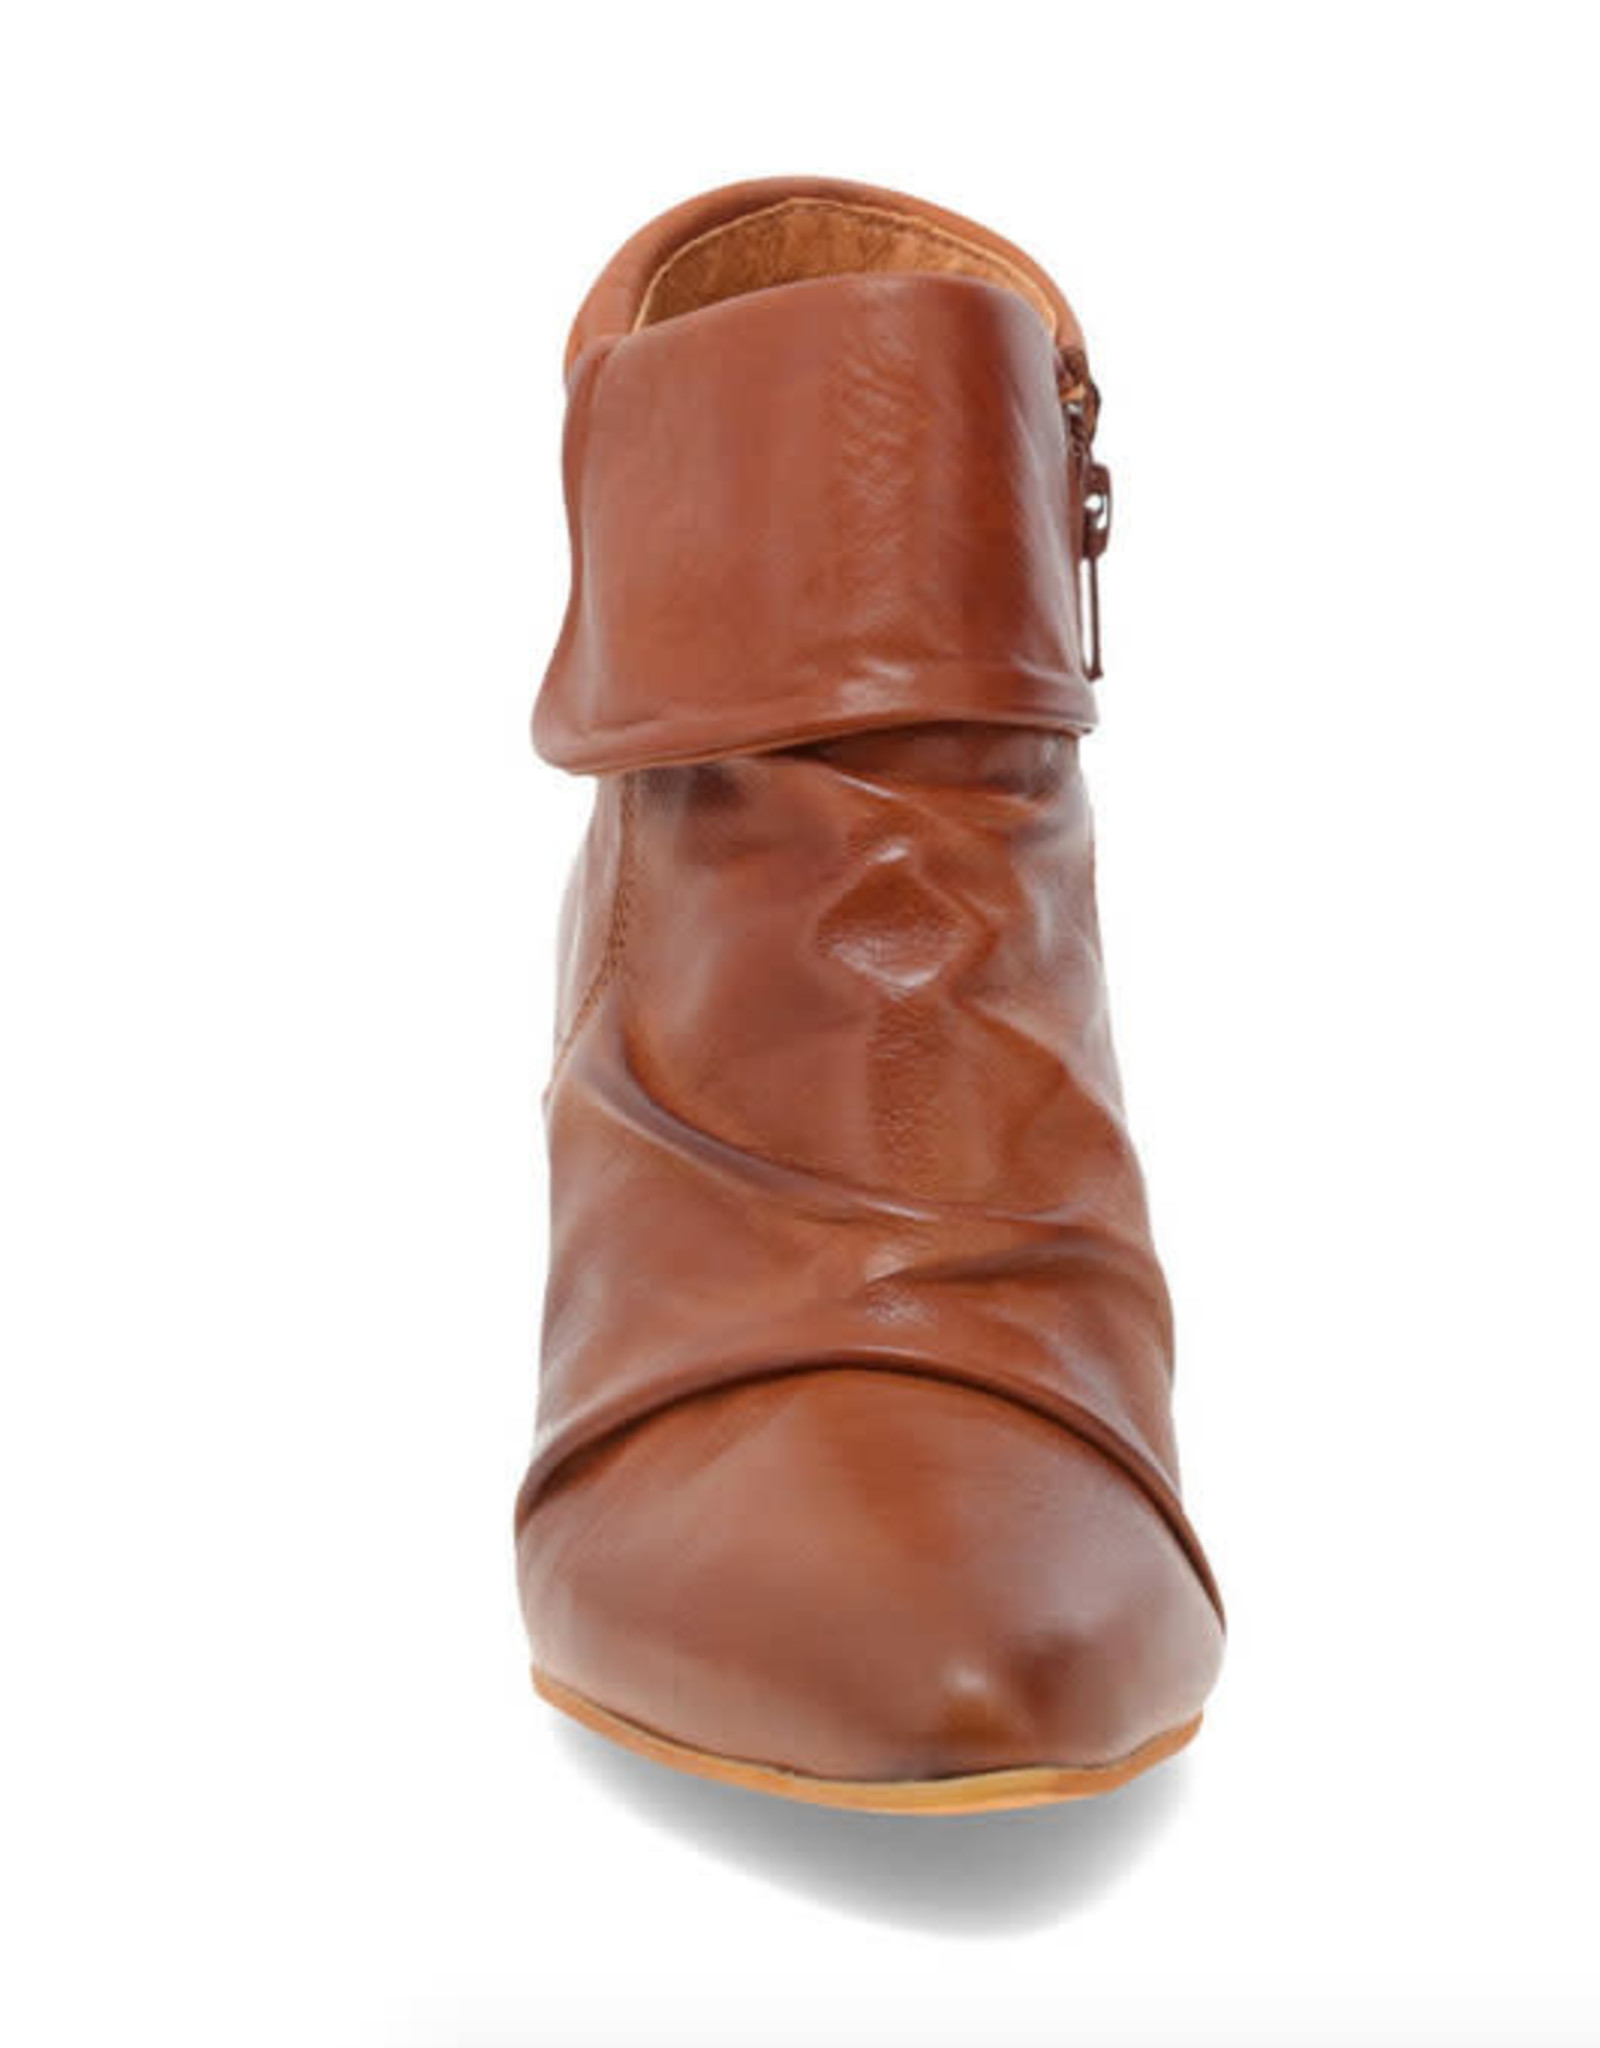 Miz Mooz Atticus Boots